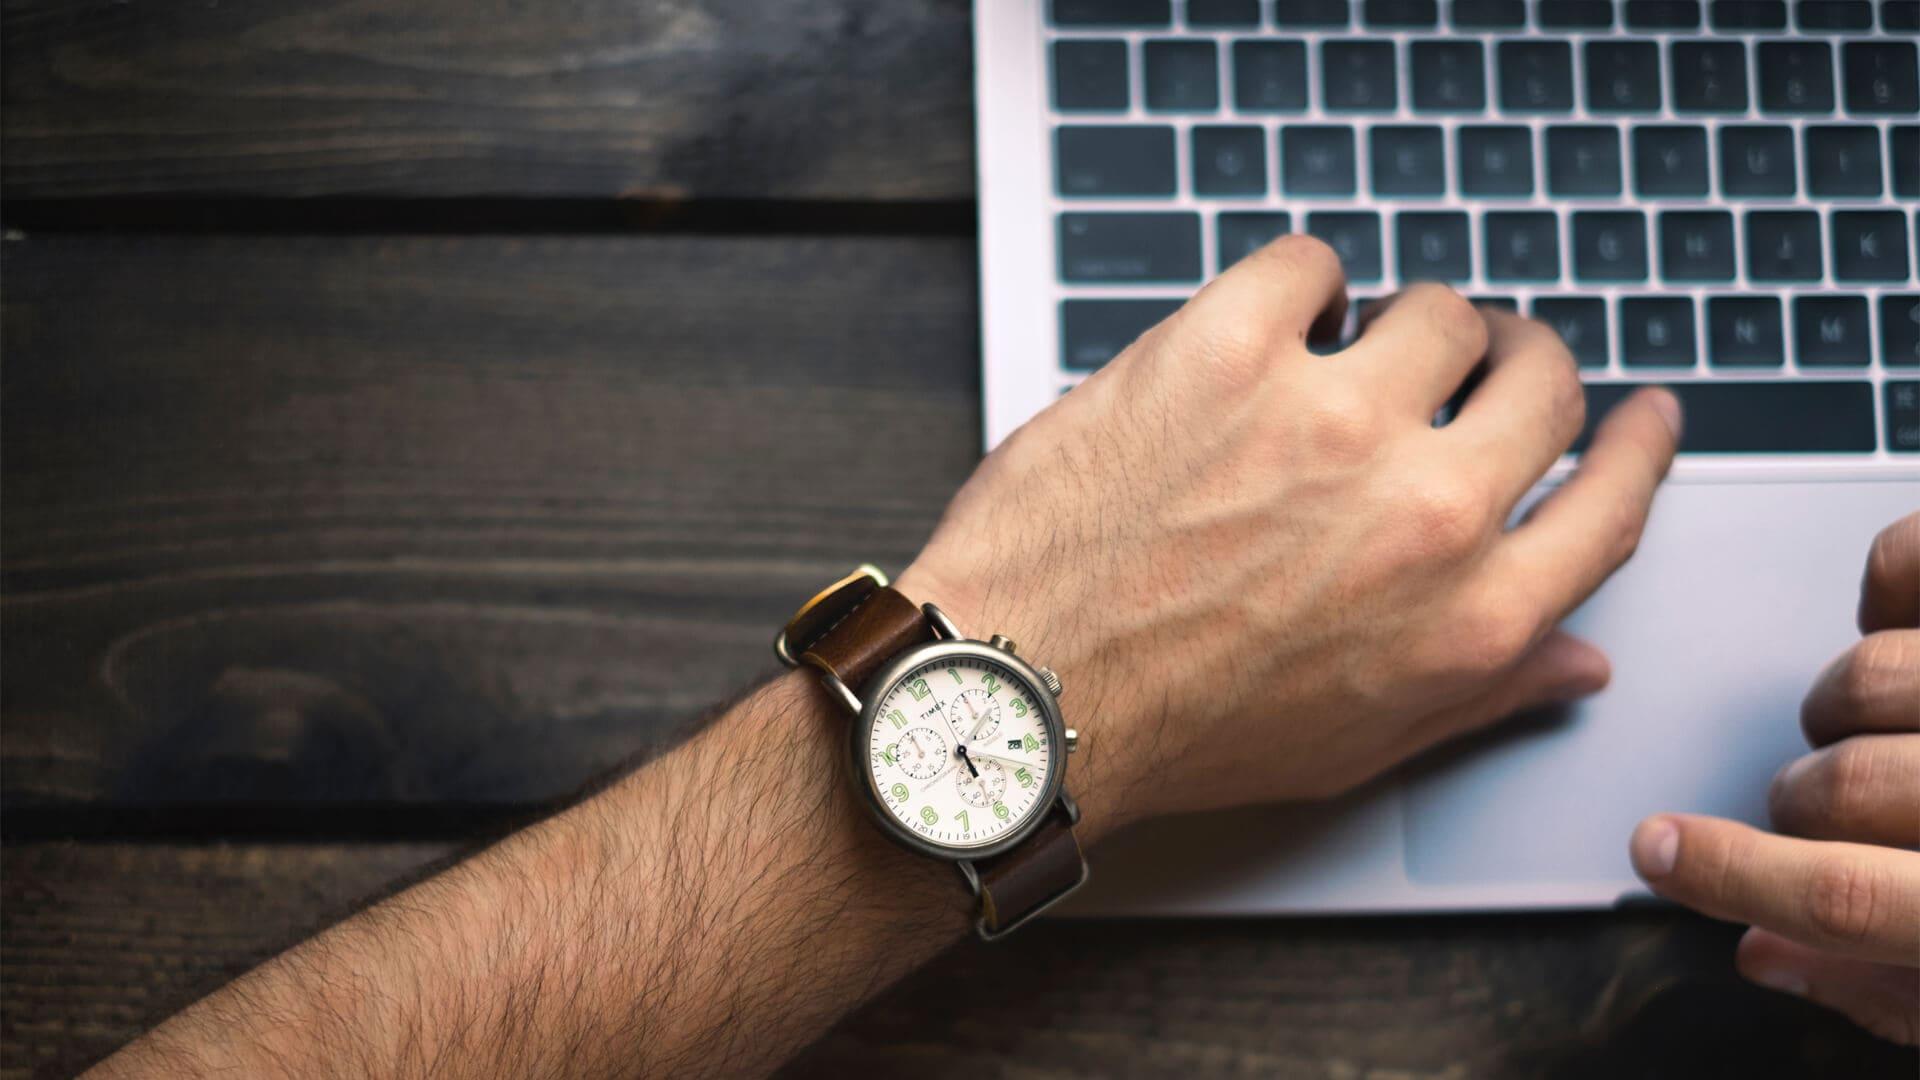 Employee time